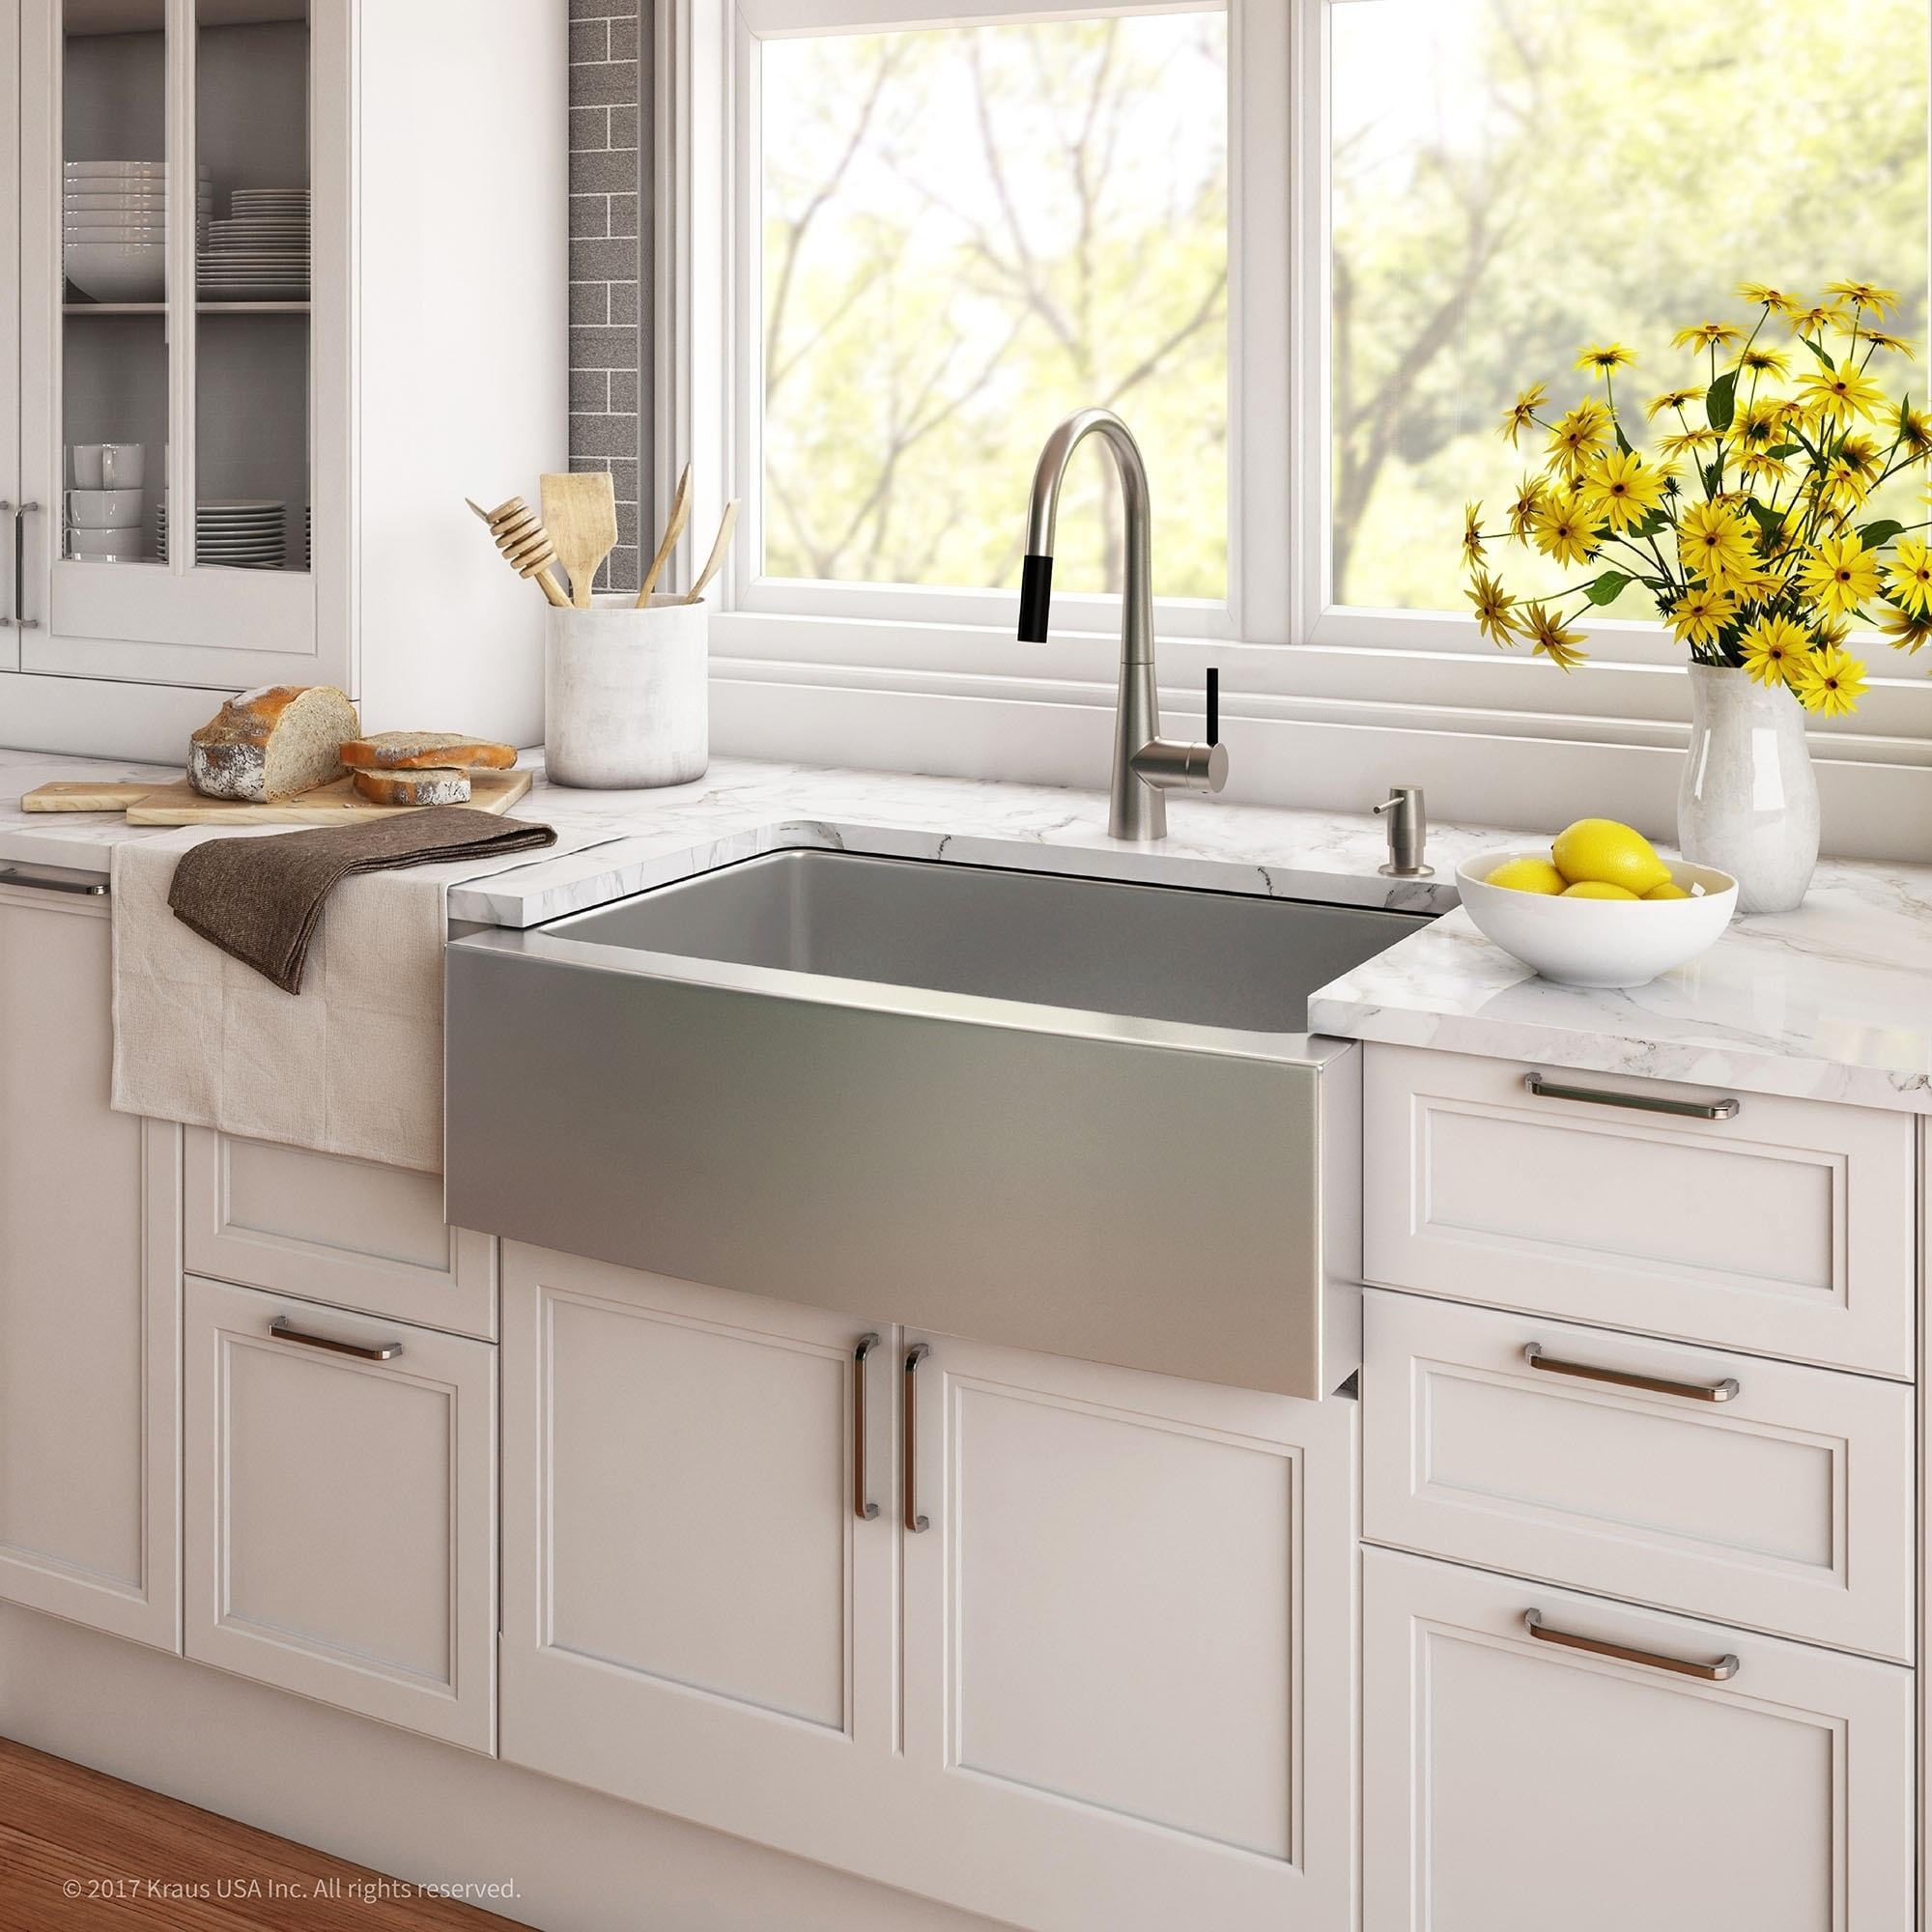 dishdrawer single softener racking incl fisher pin drawer full dishwasher and flex water paykel